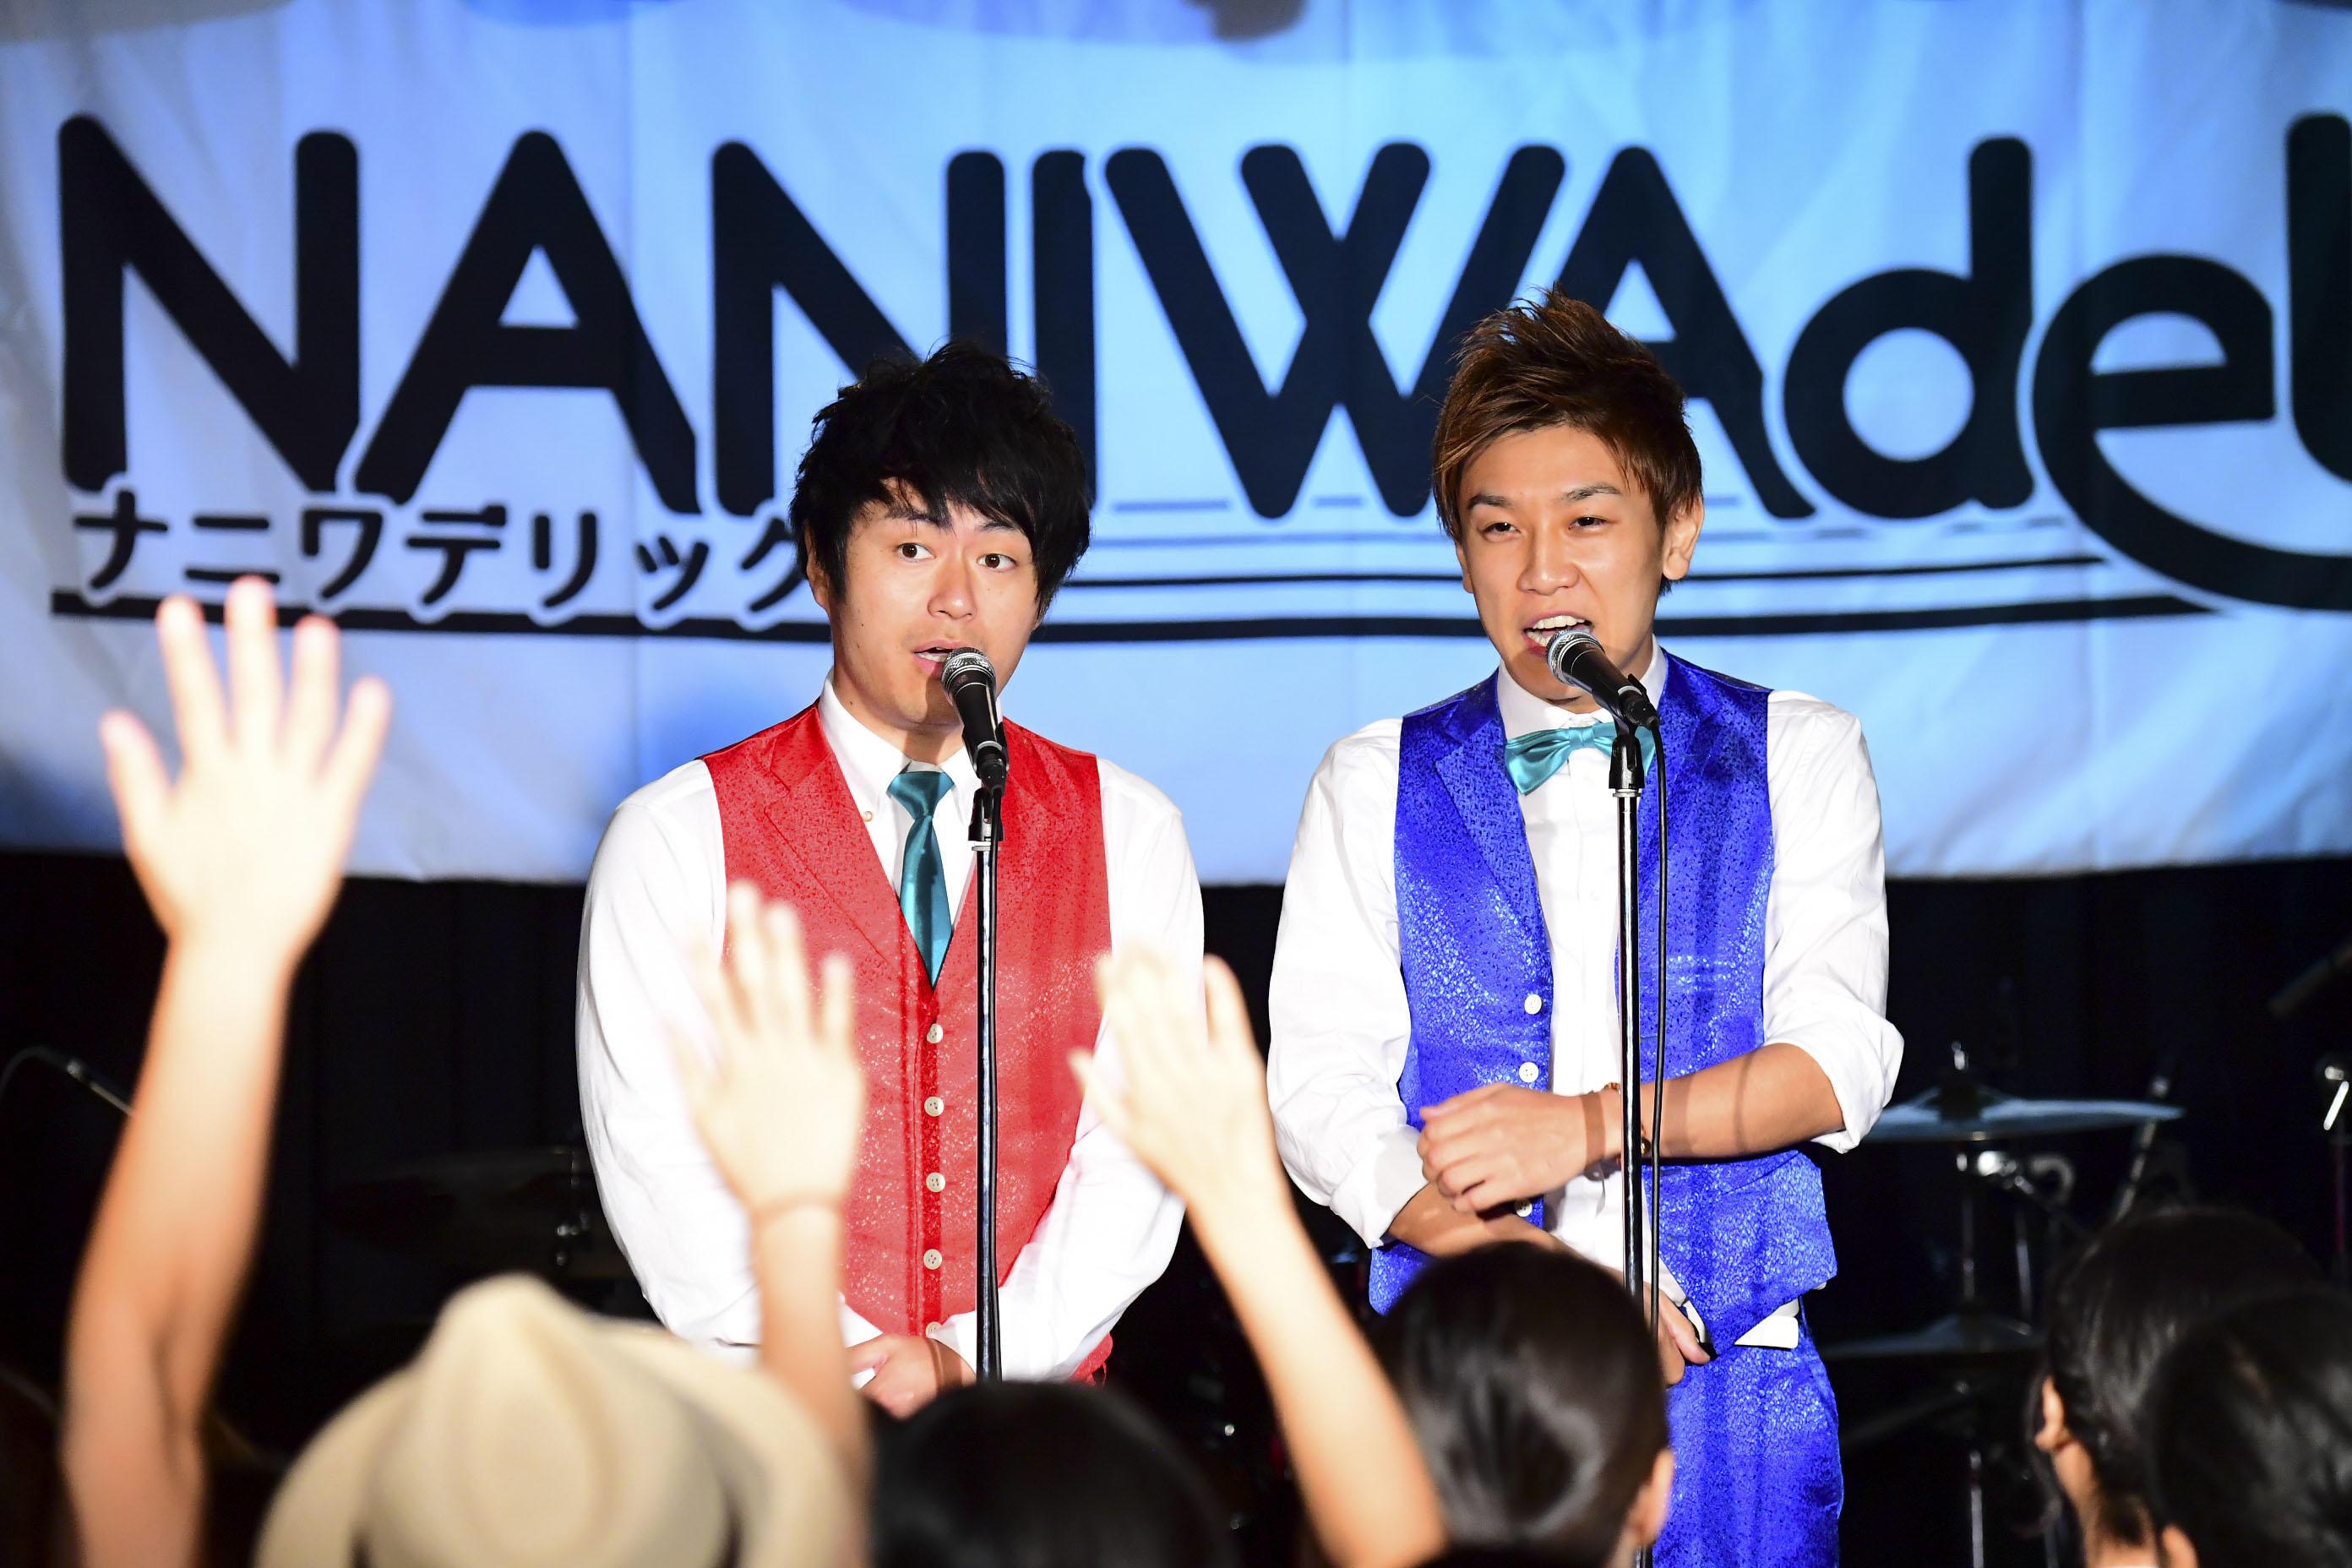 http://news.yoshimoto.co.jp/20170802094239-7ed2d434a2b137734e85519966e03f6b6fc32734.jpg